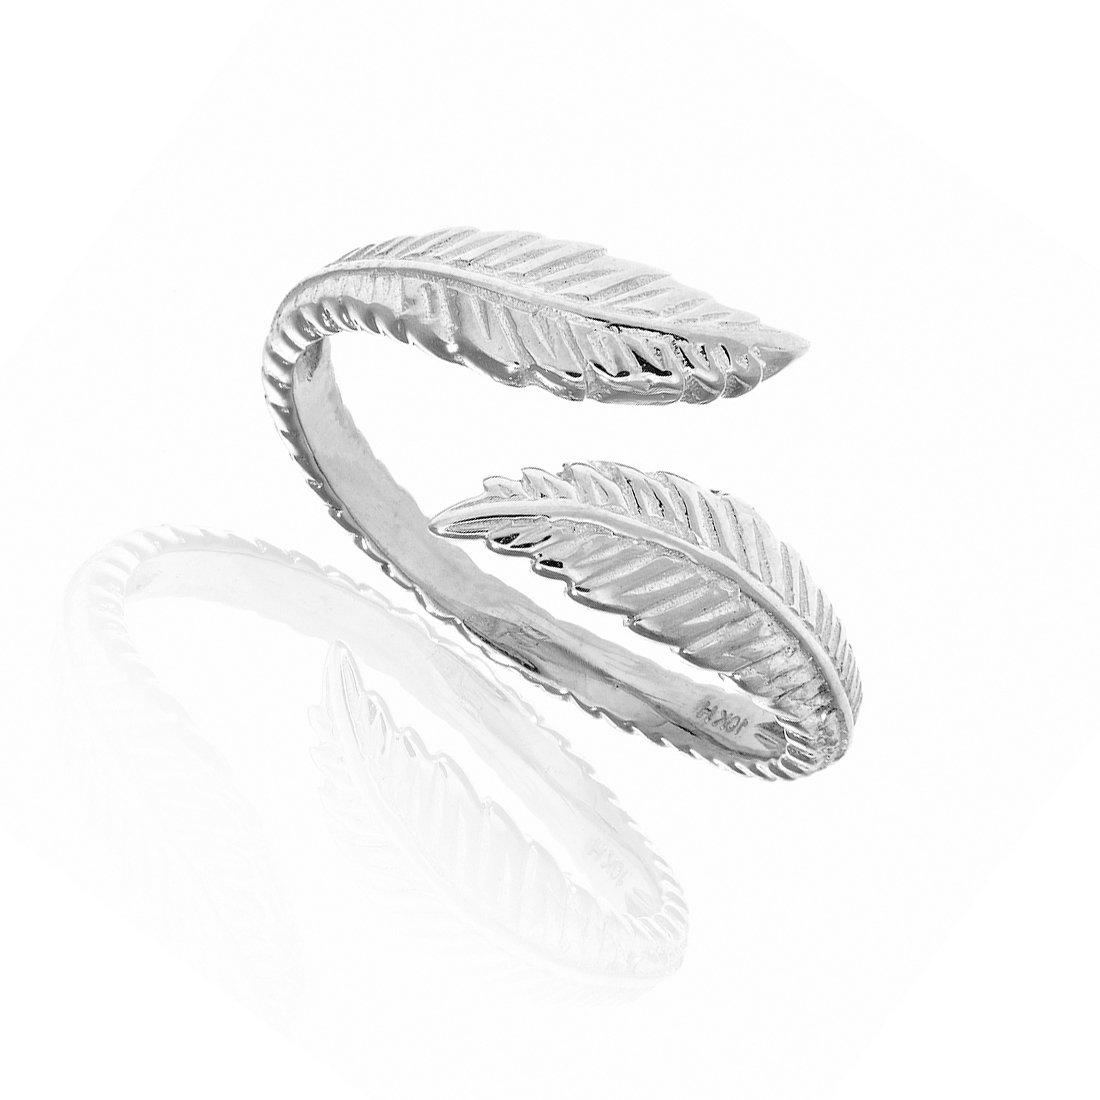 10k White Gold Leaf Cross Over Adjustable Ring or Toe Ring Ritastephens